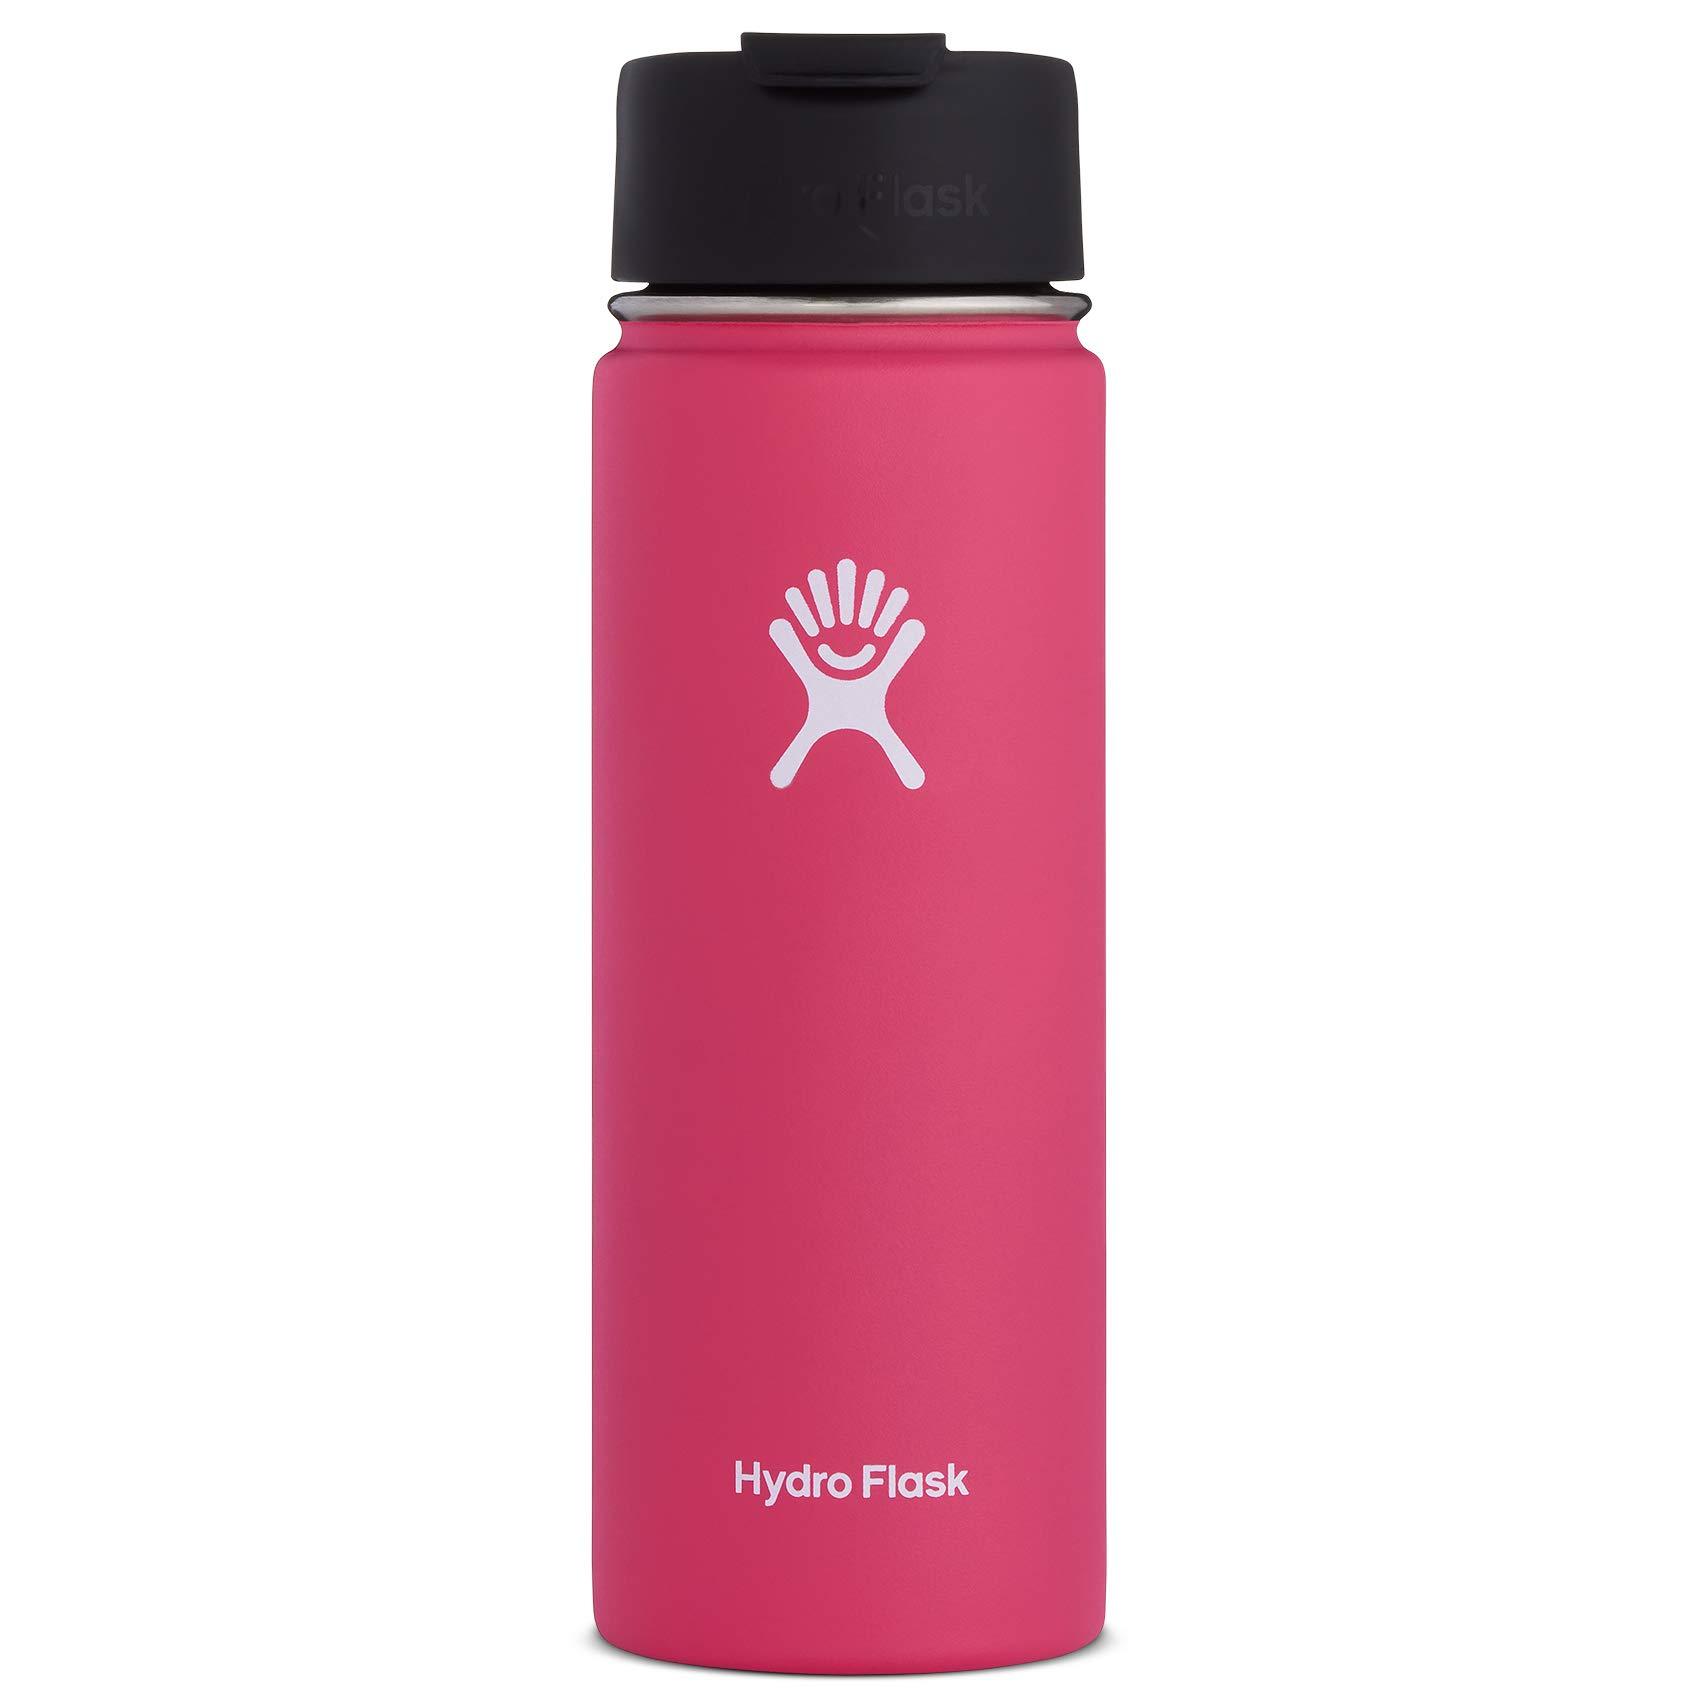 Hydro Flask Travel Coffee Flask, 20 oz, Watermelon by Hydro Flask